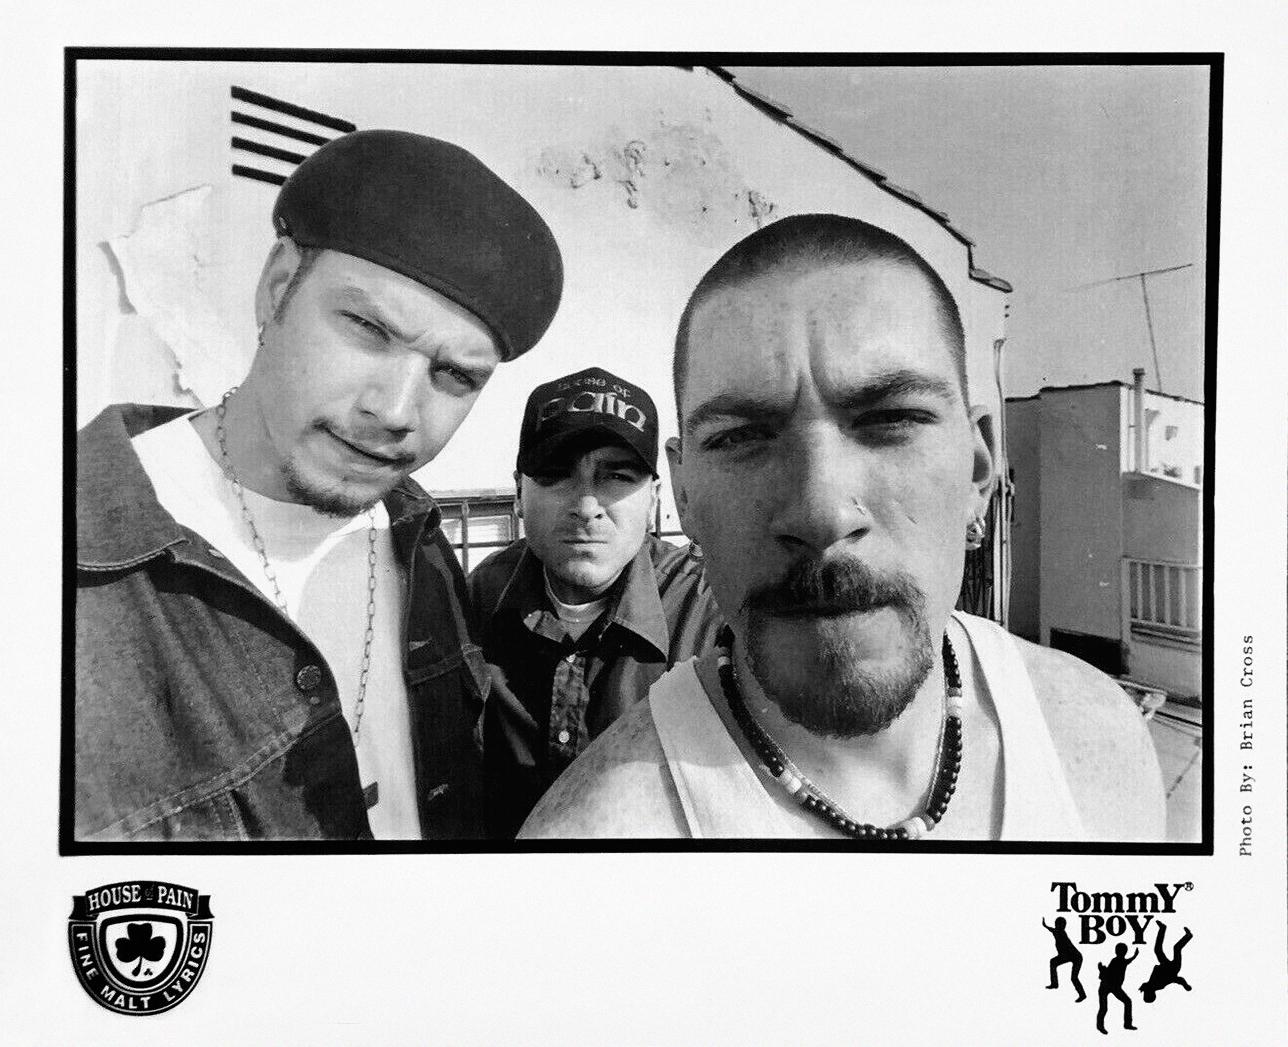 House Of Pain Fine Malt Lyrics Everlast Dj Lethal Cypress Hill T Shirt 59